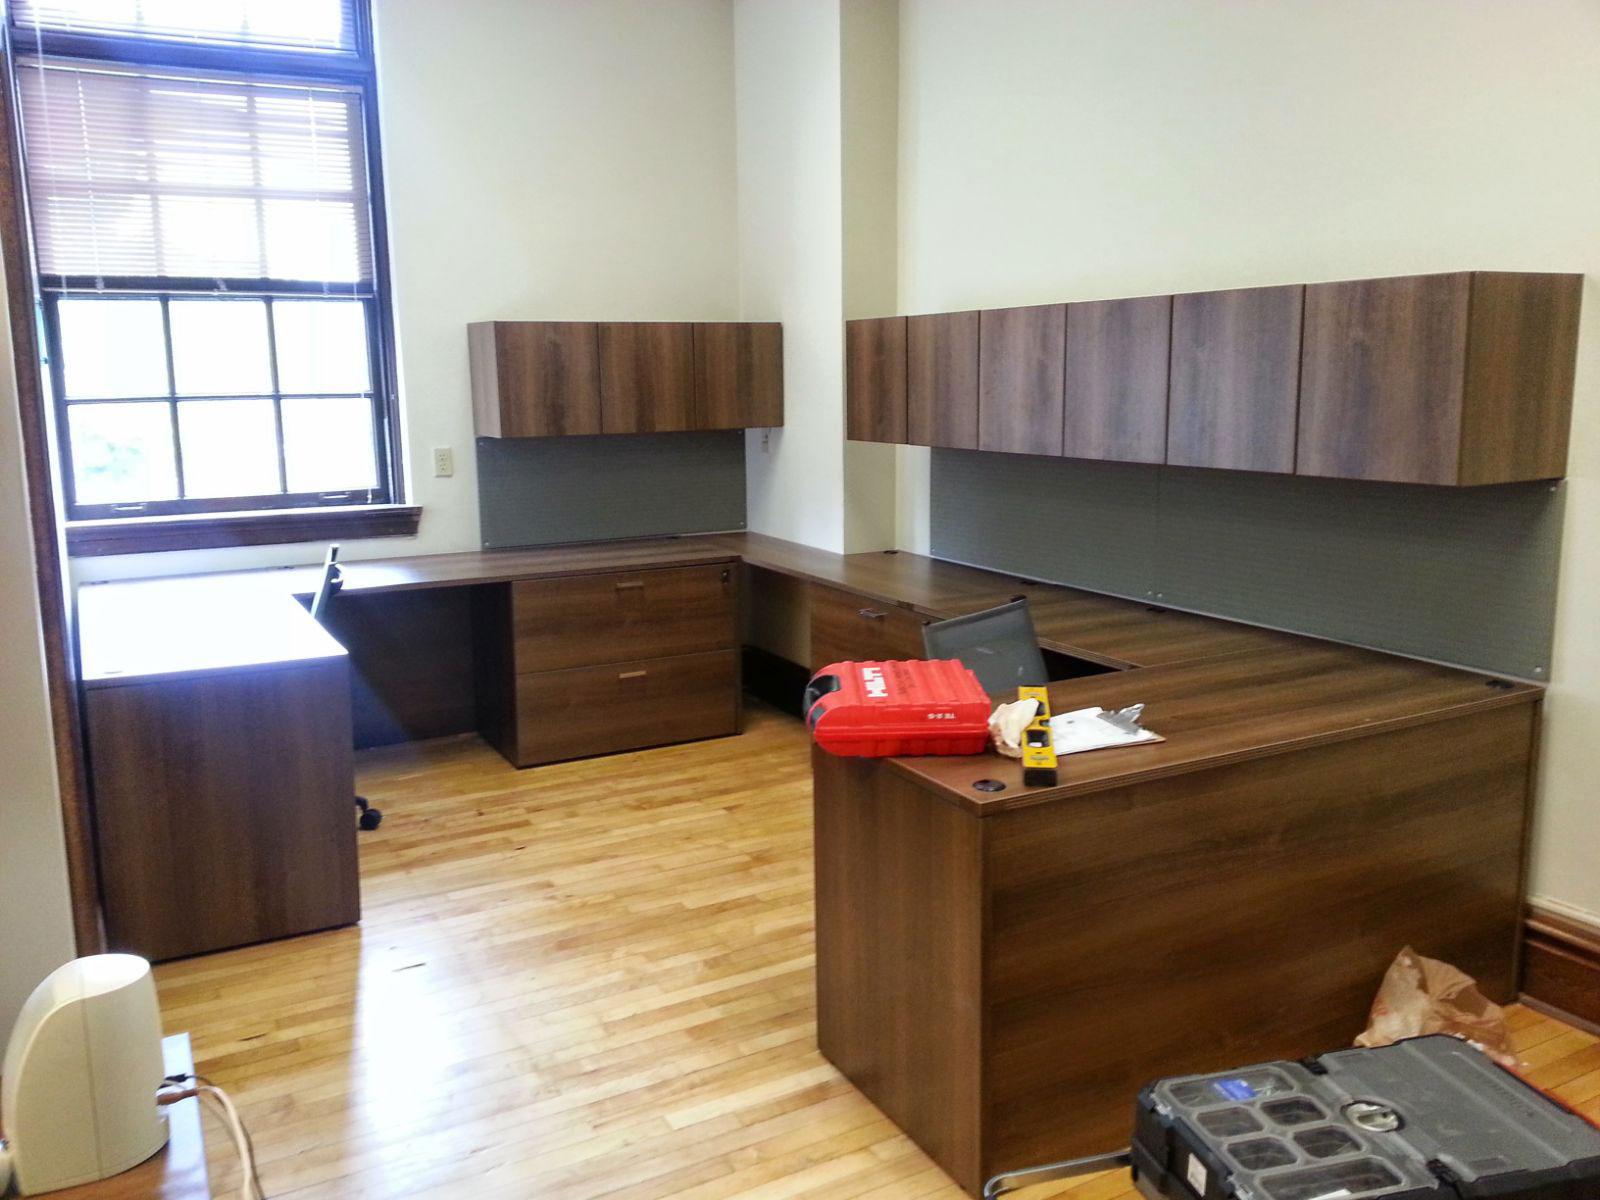 Hazzaed Moving Storage Installation Record Storage in St Louis Office Installation